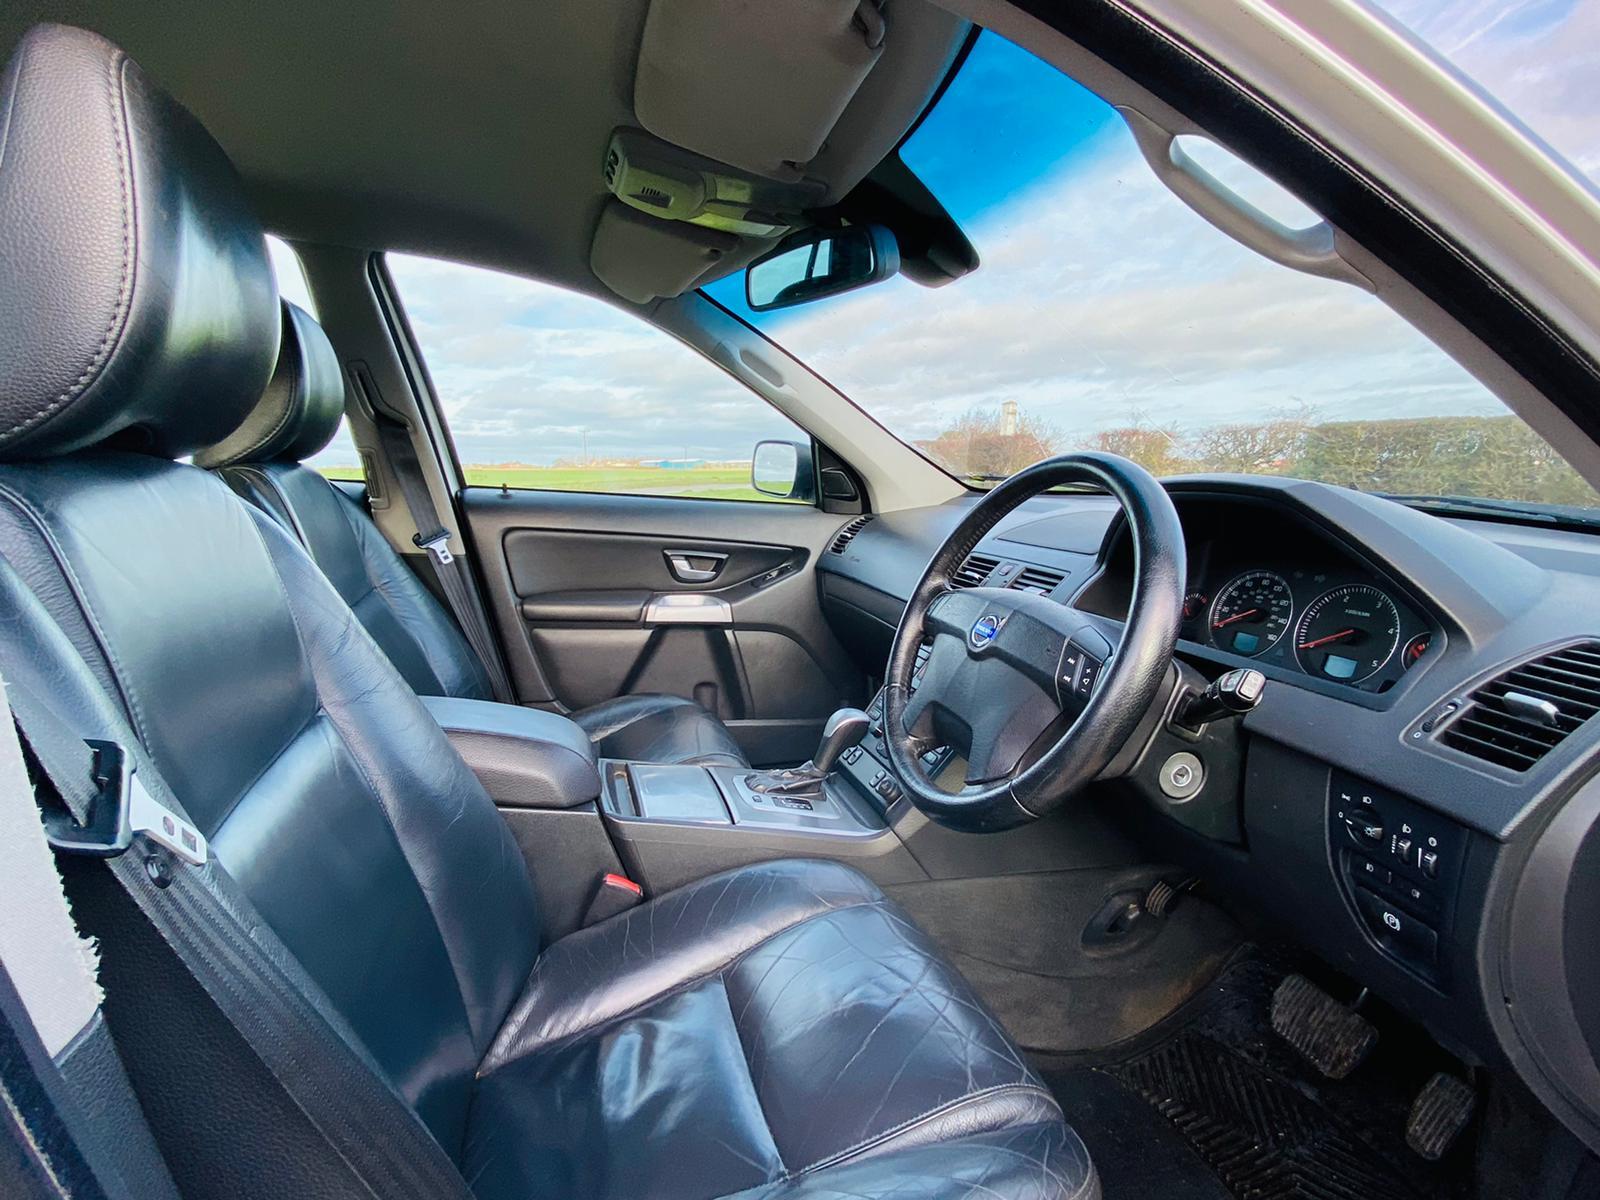 Volvo XC90 2.4 D5 185bhp SE Geartronic Auto 2006 06 Reg - 7 Seats - Air con - Top Spec - Image 25 of 47